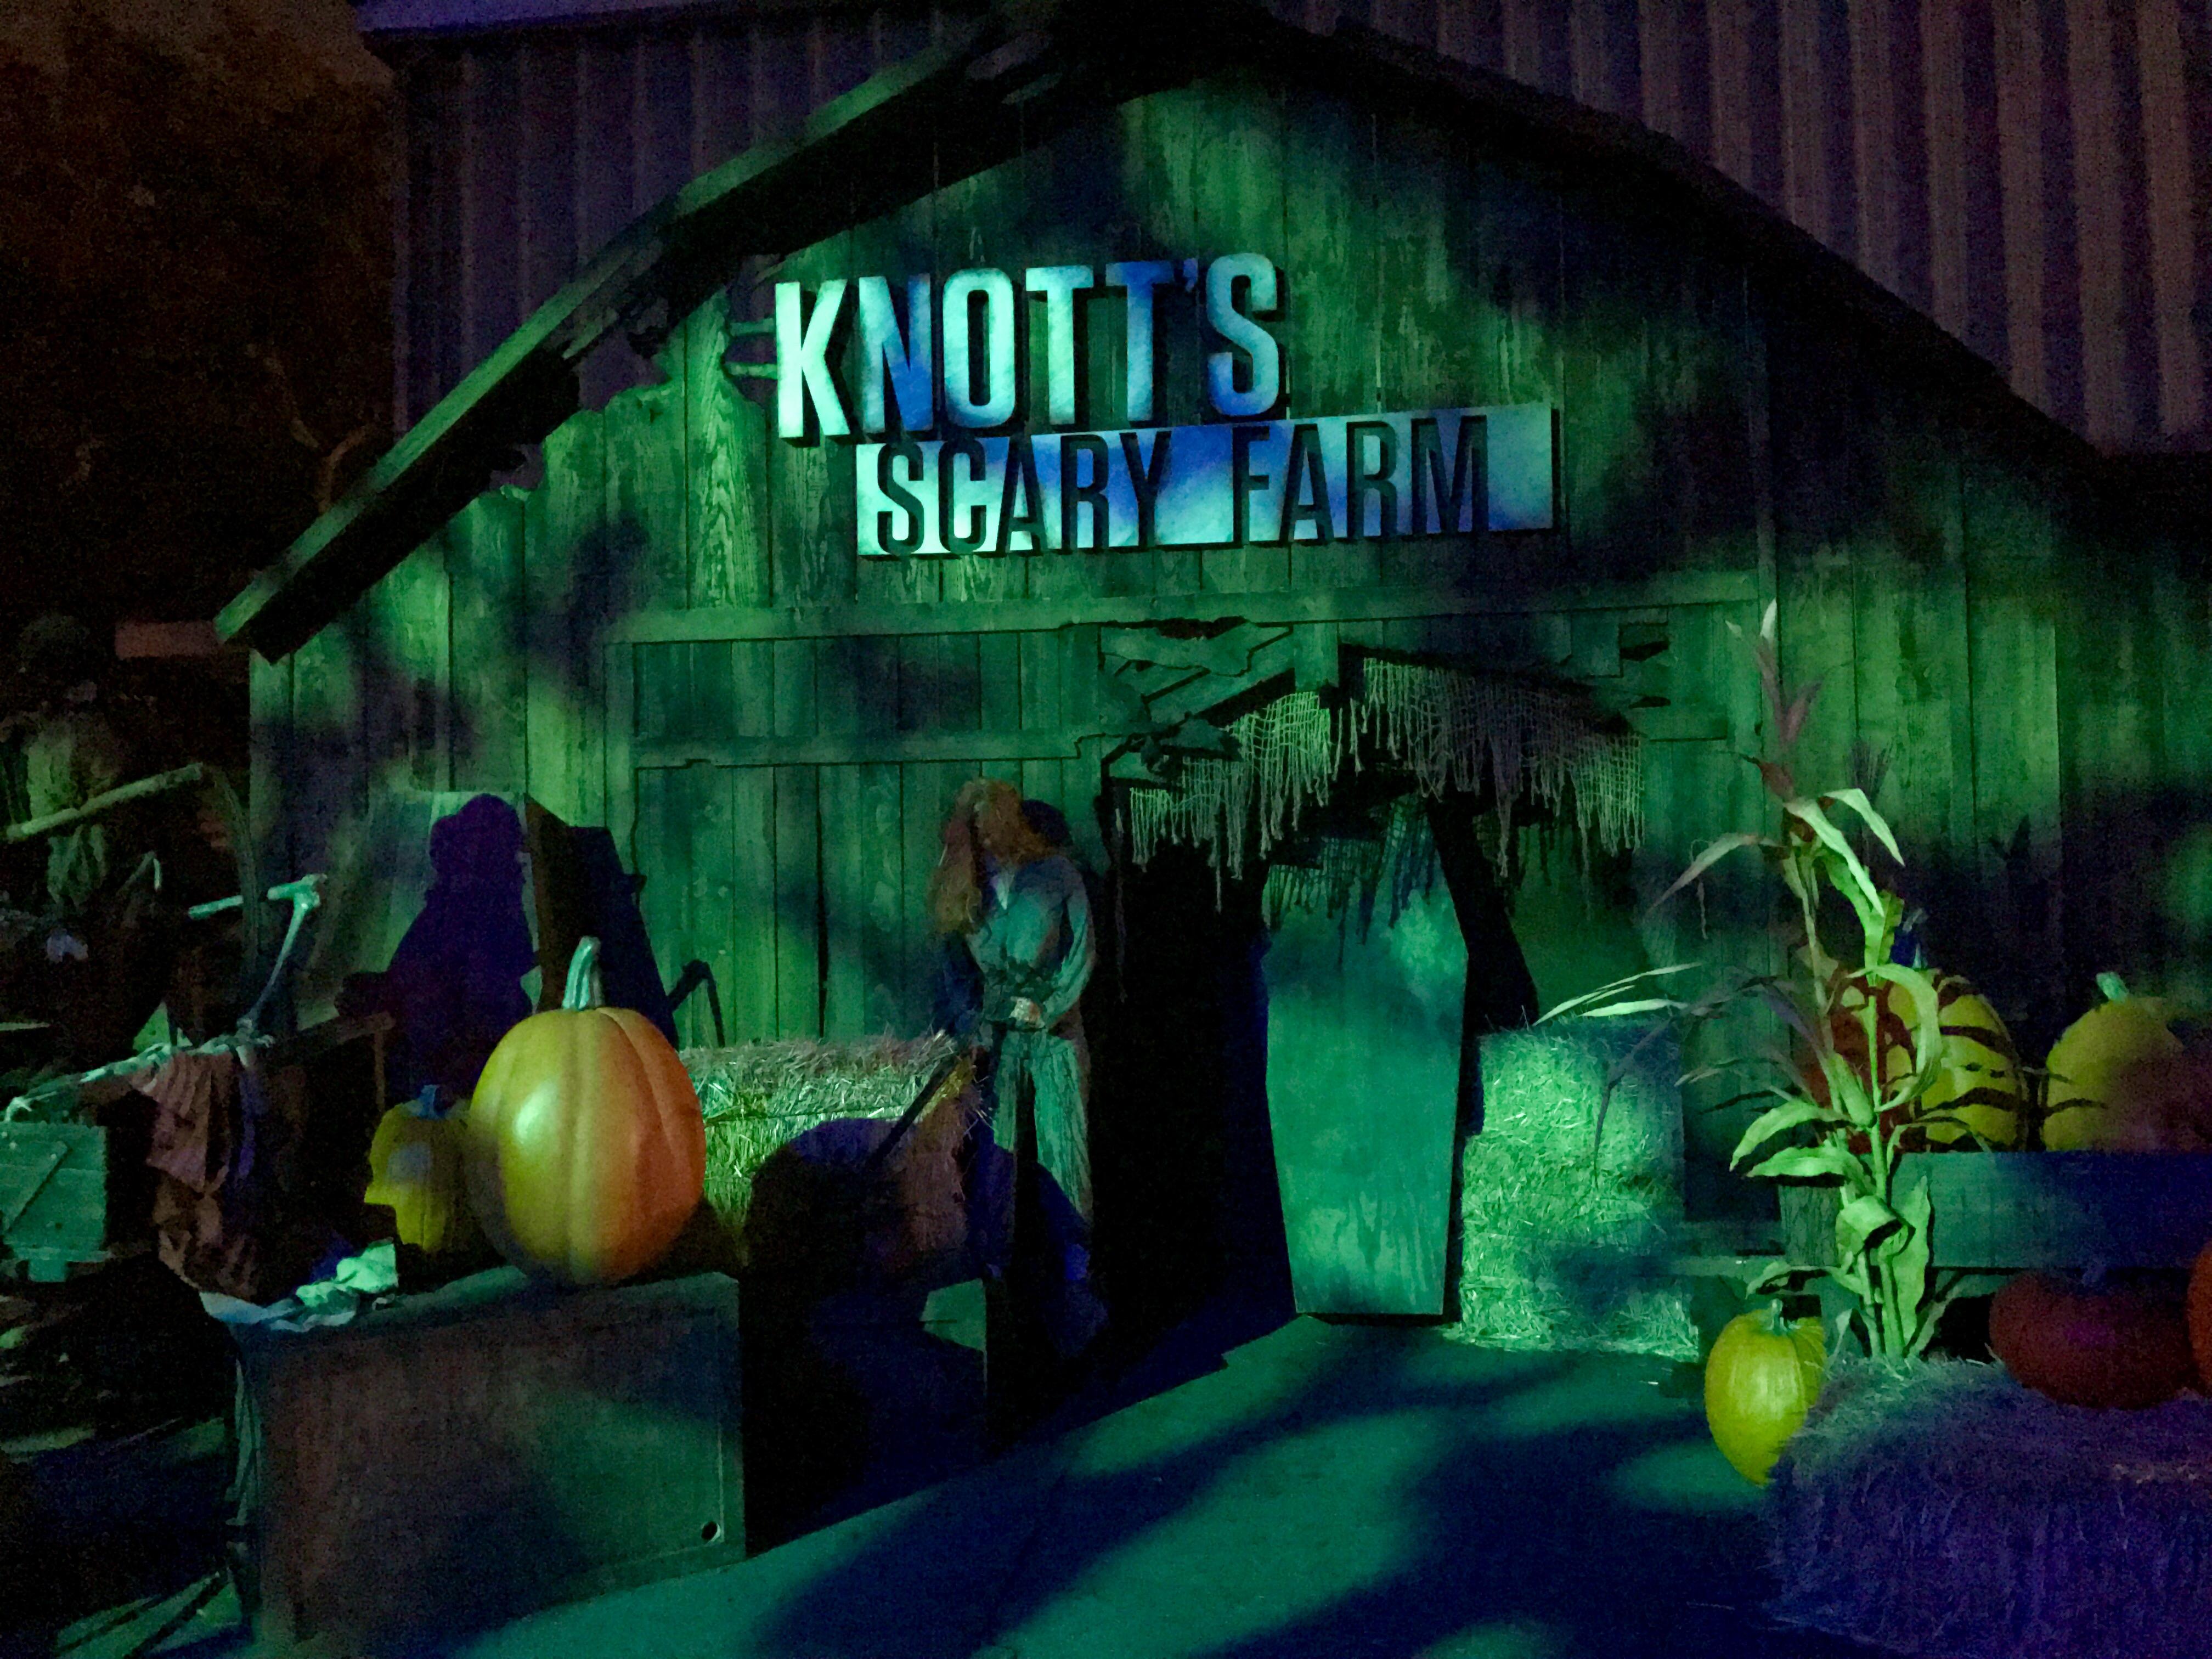 Knott's Scary Farm coupon code